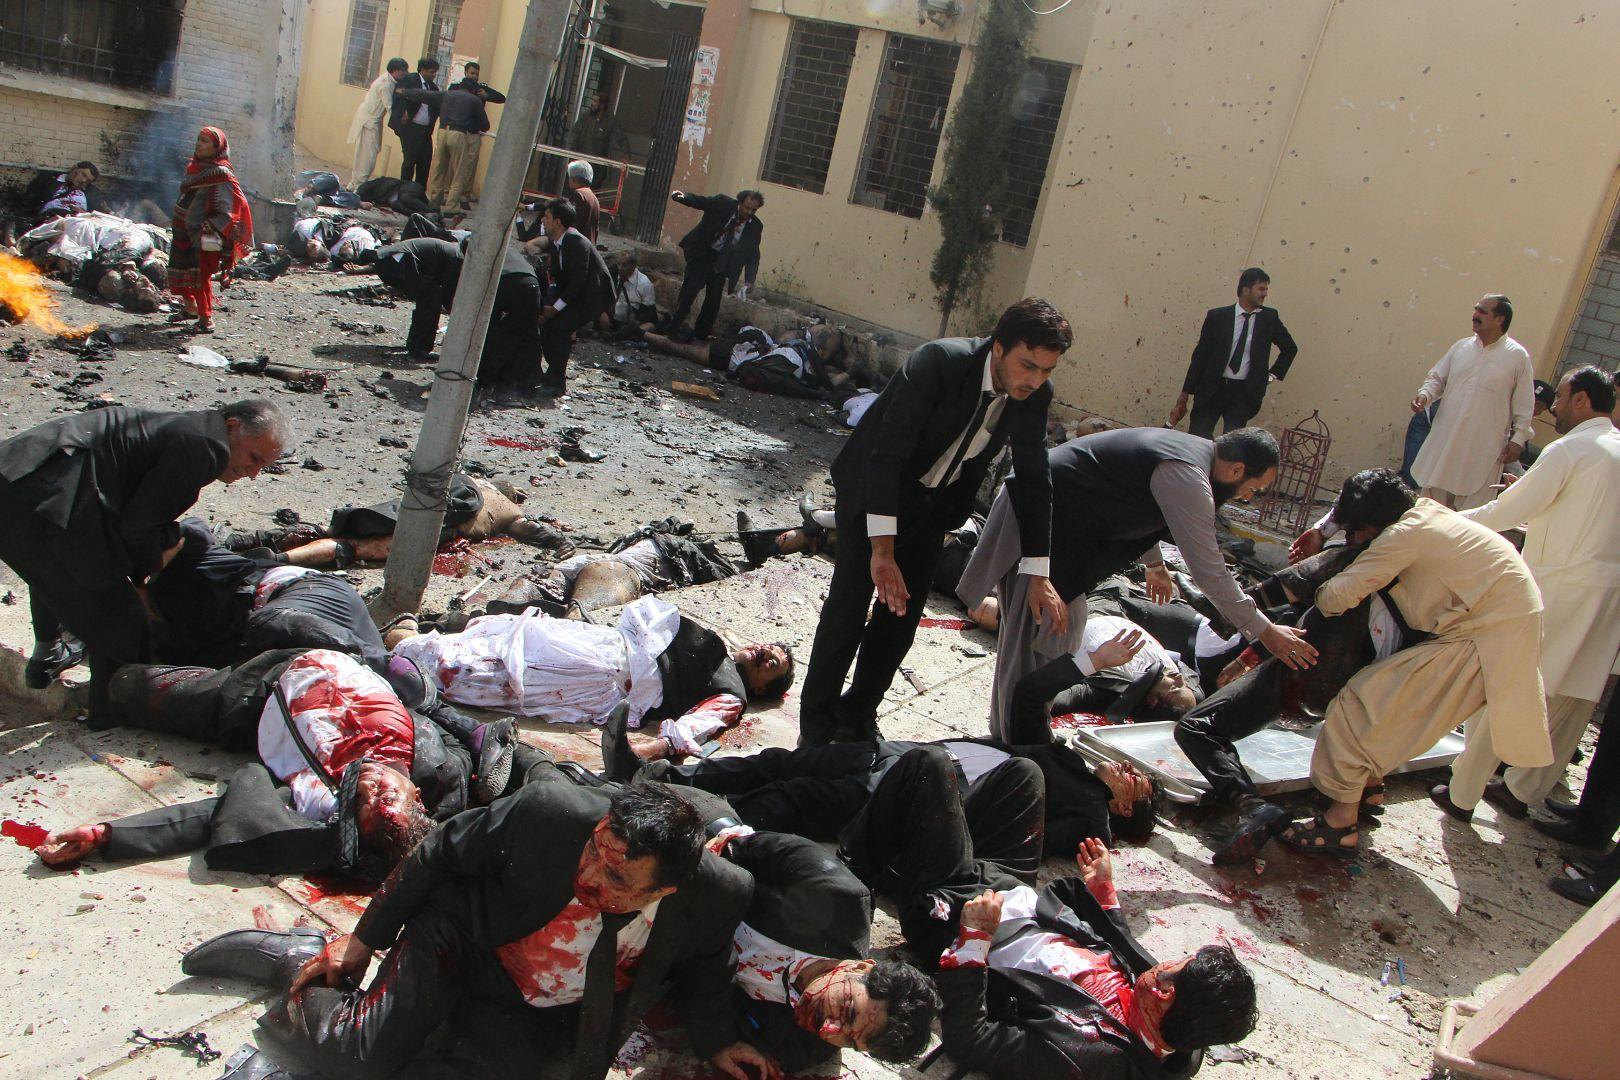 Пакистанский взрыв бомбы, © Джамал Таракай, Пакистан, Фотоконкурс World Press Photo